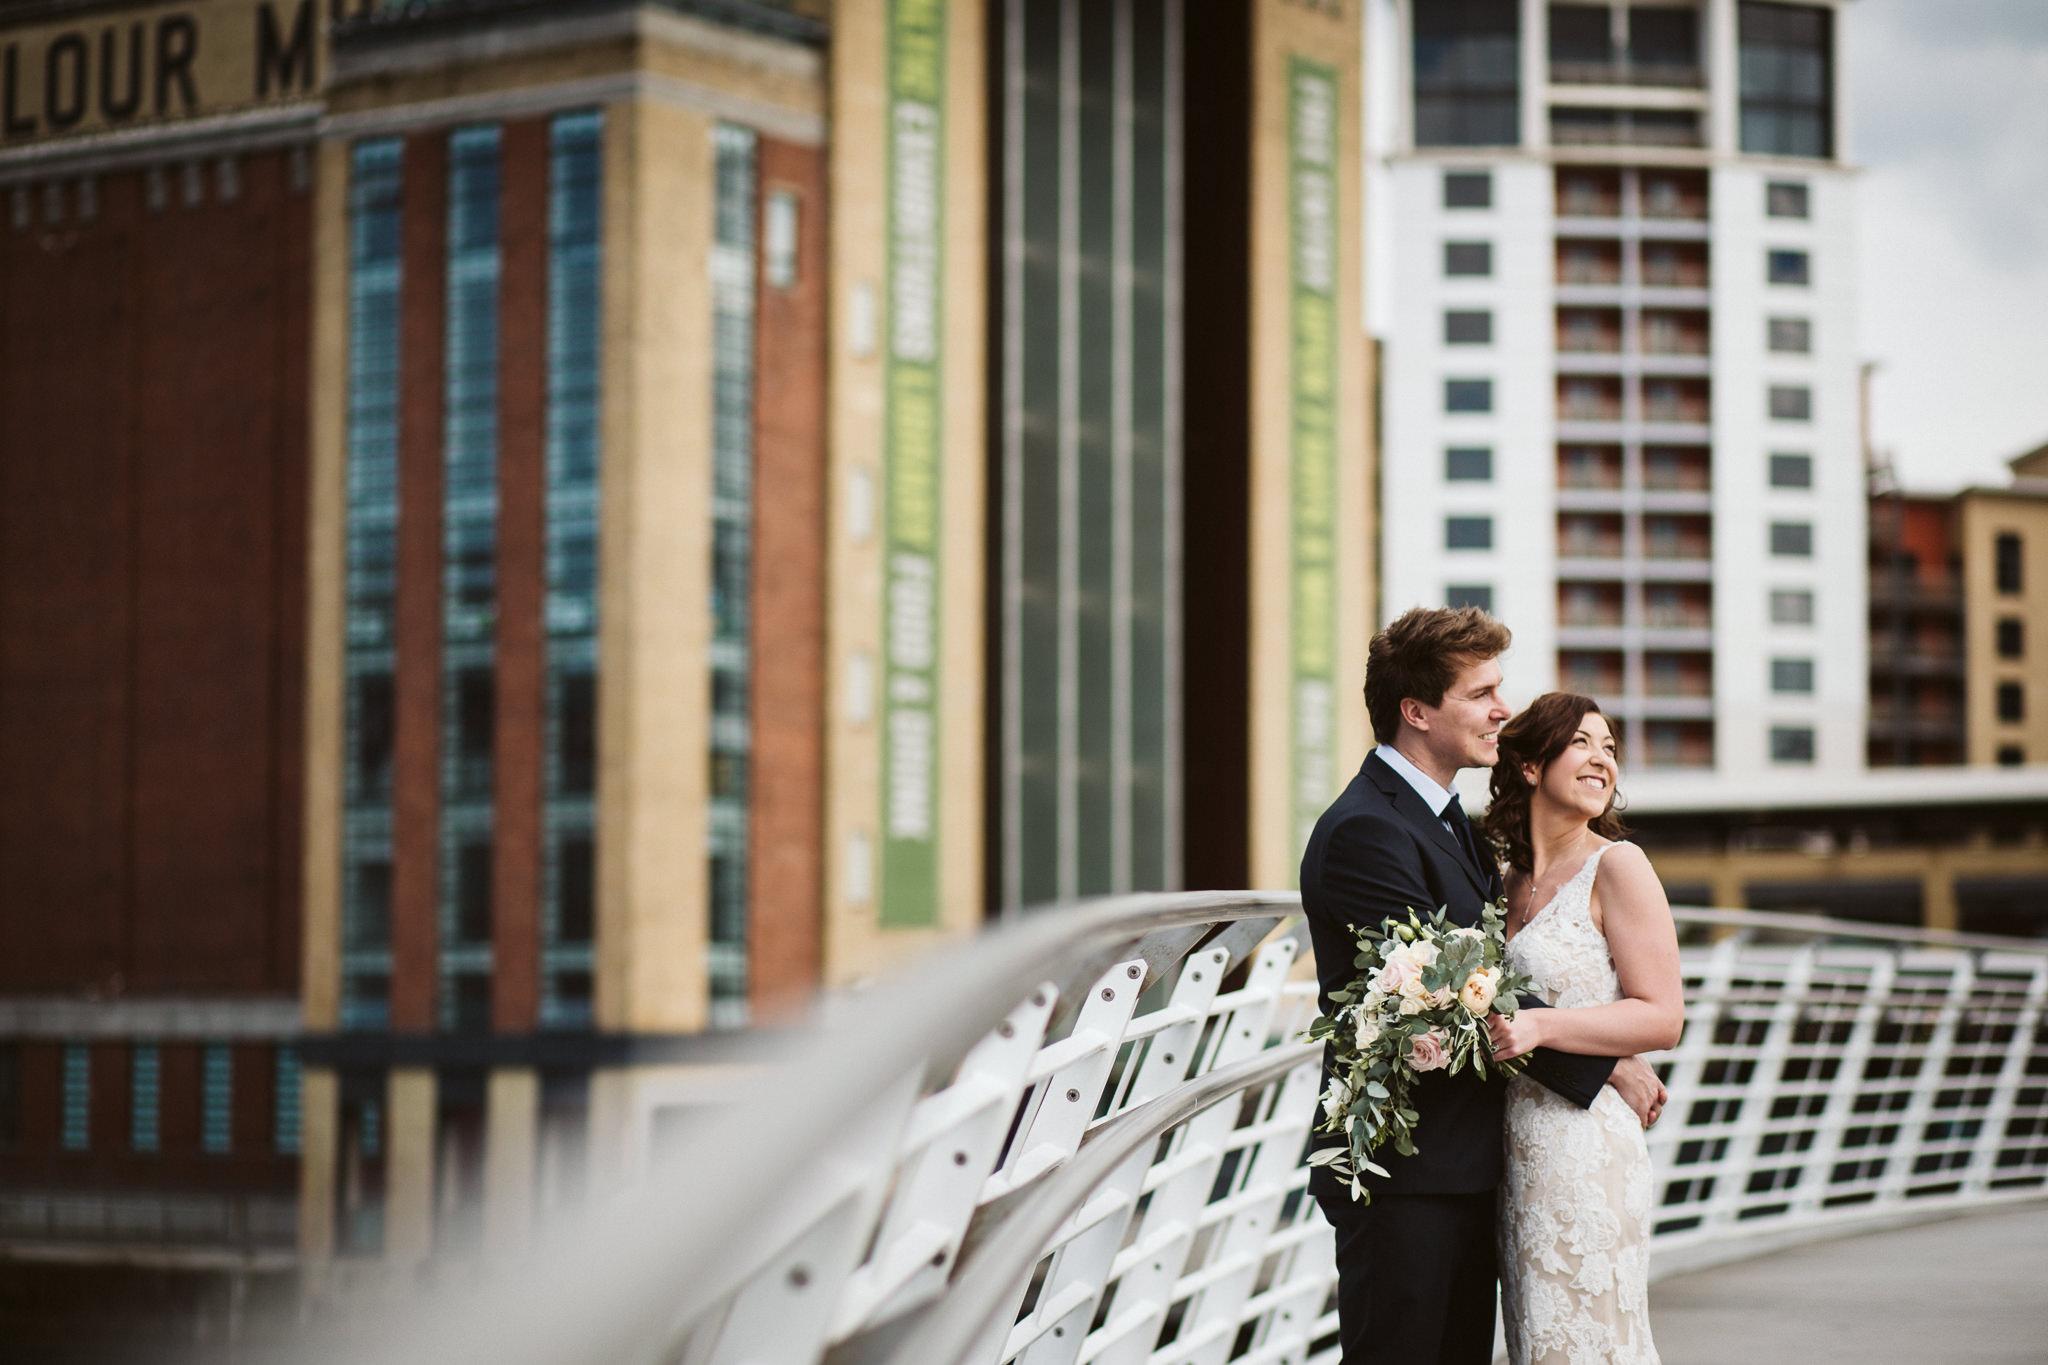 baltic-wedding-margarita-hope (44).jpg